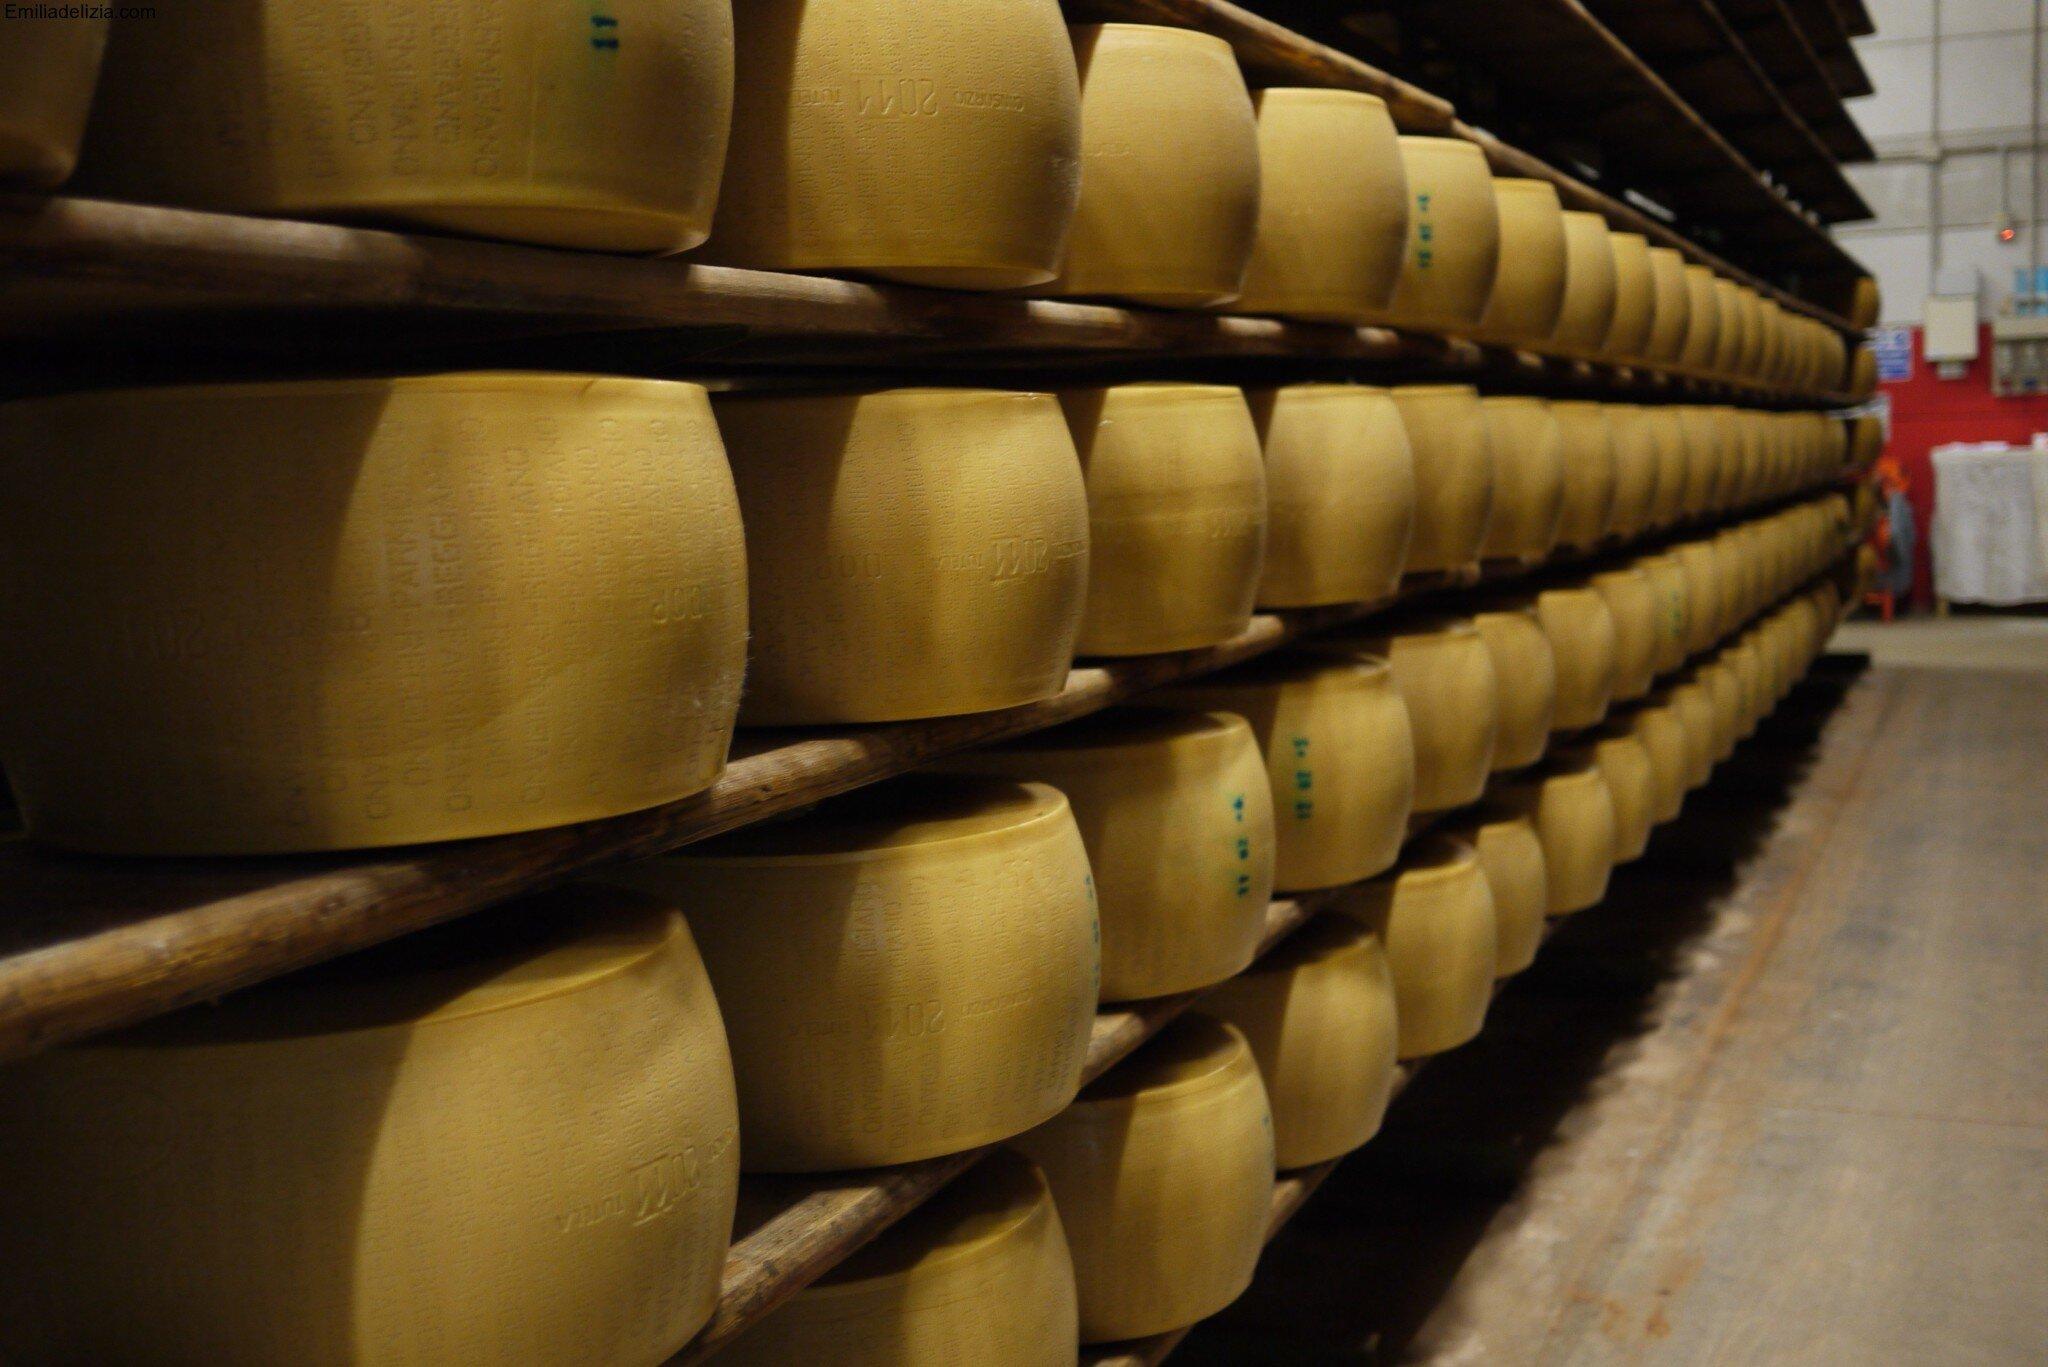 ageing Parmesan cheese